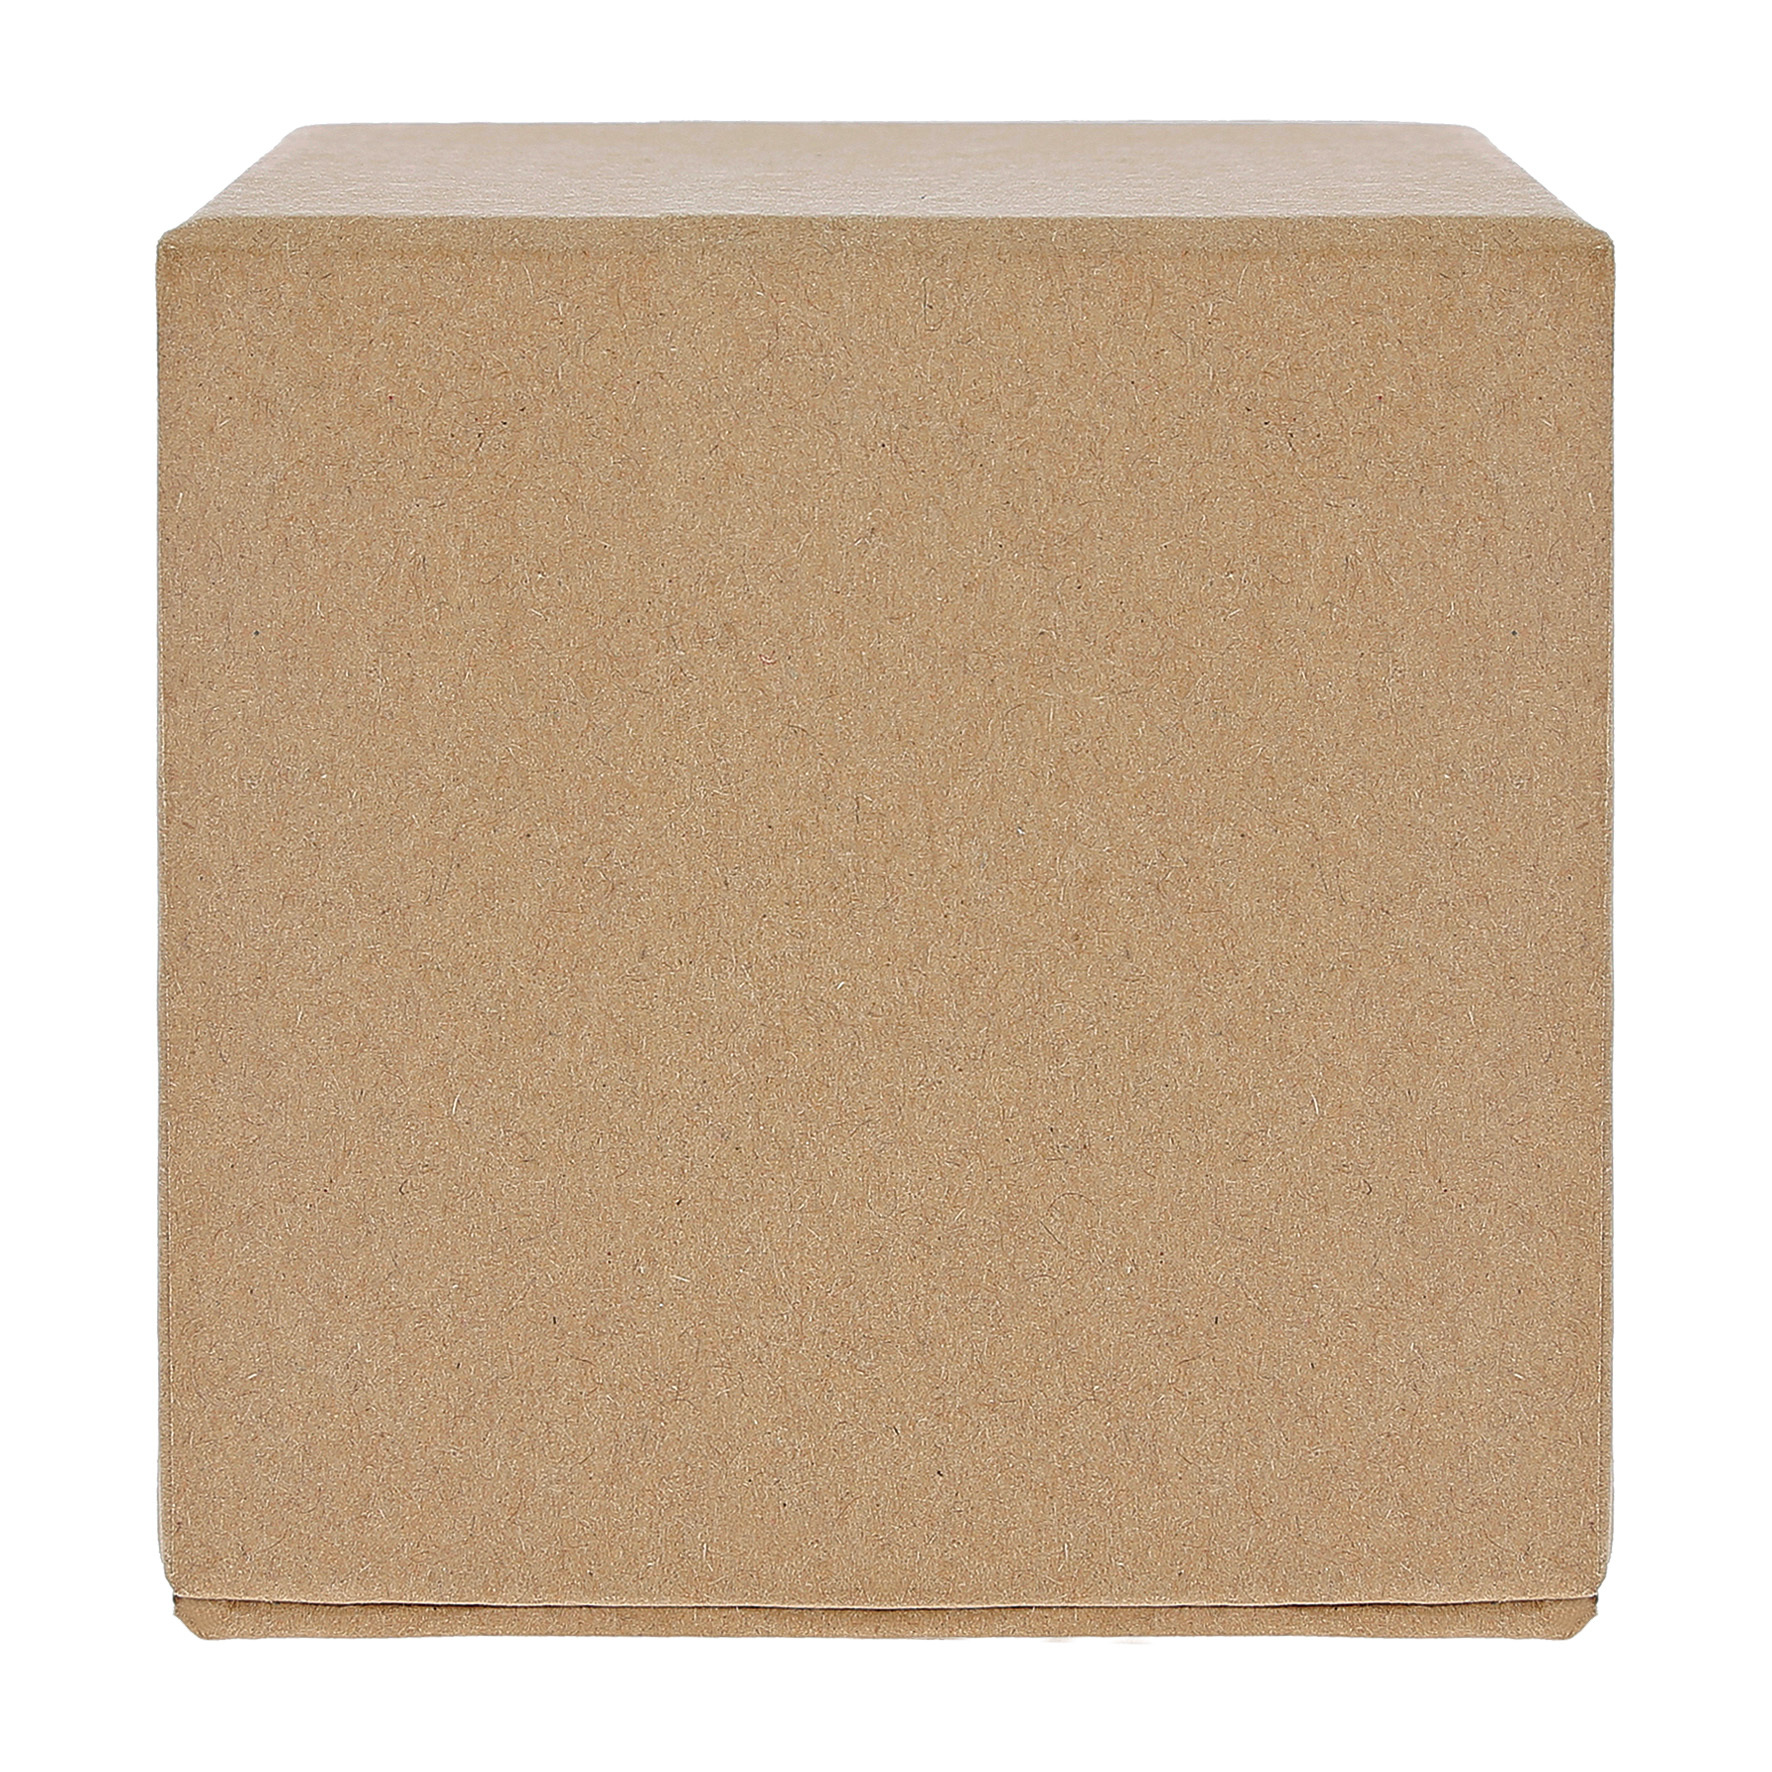 Cube - 22-1287-3